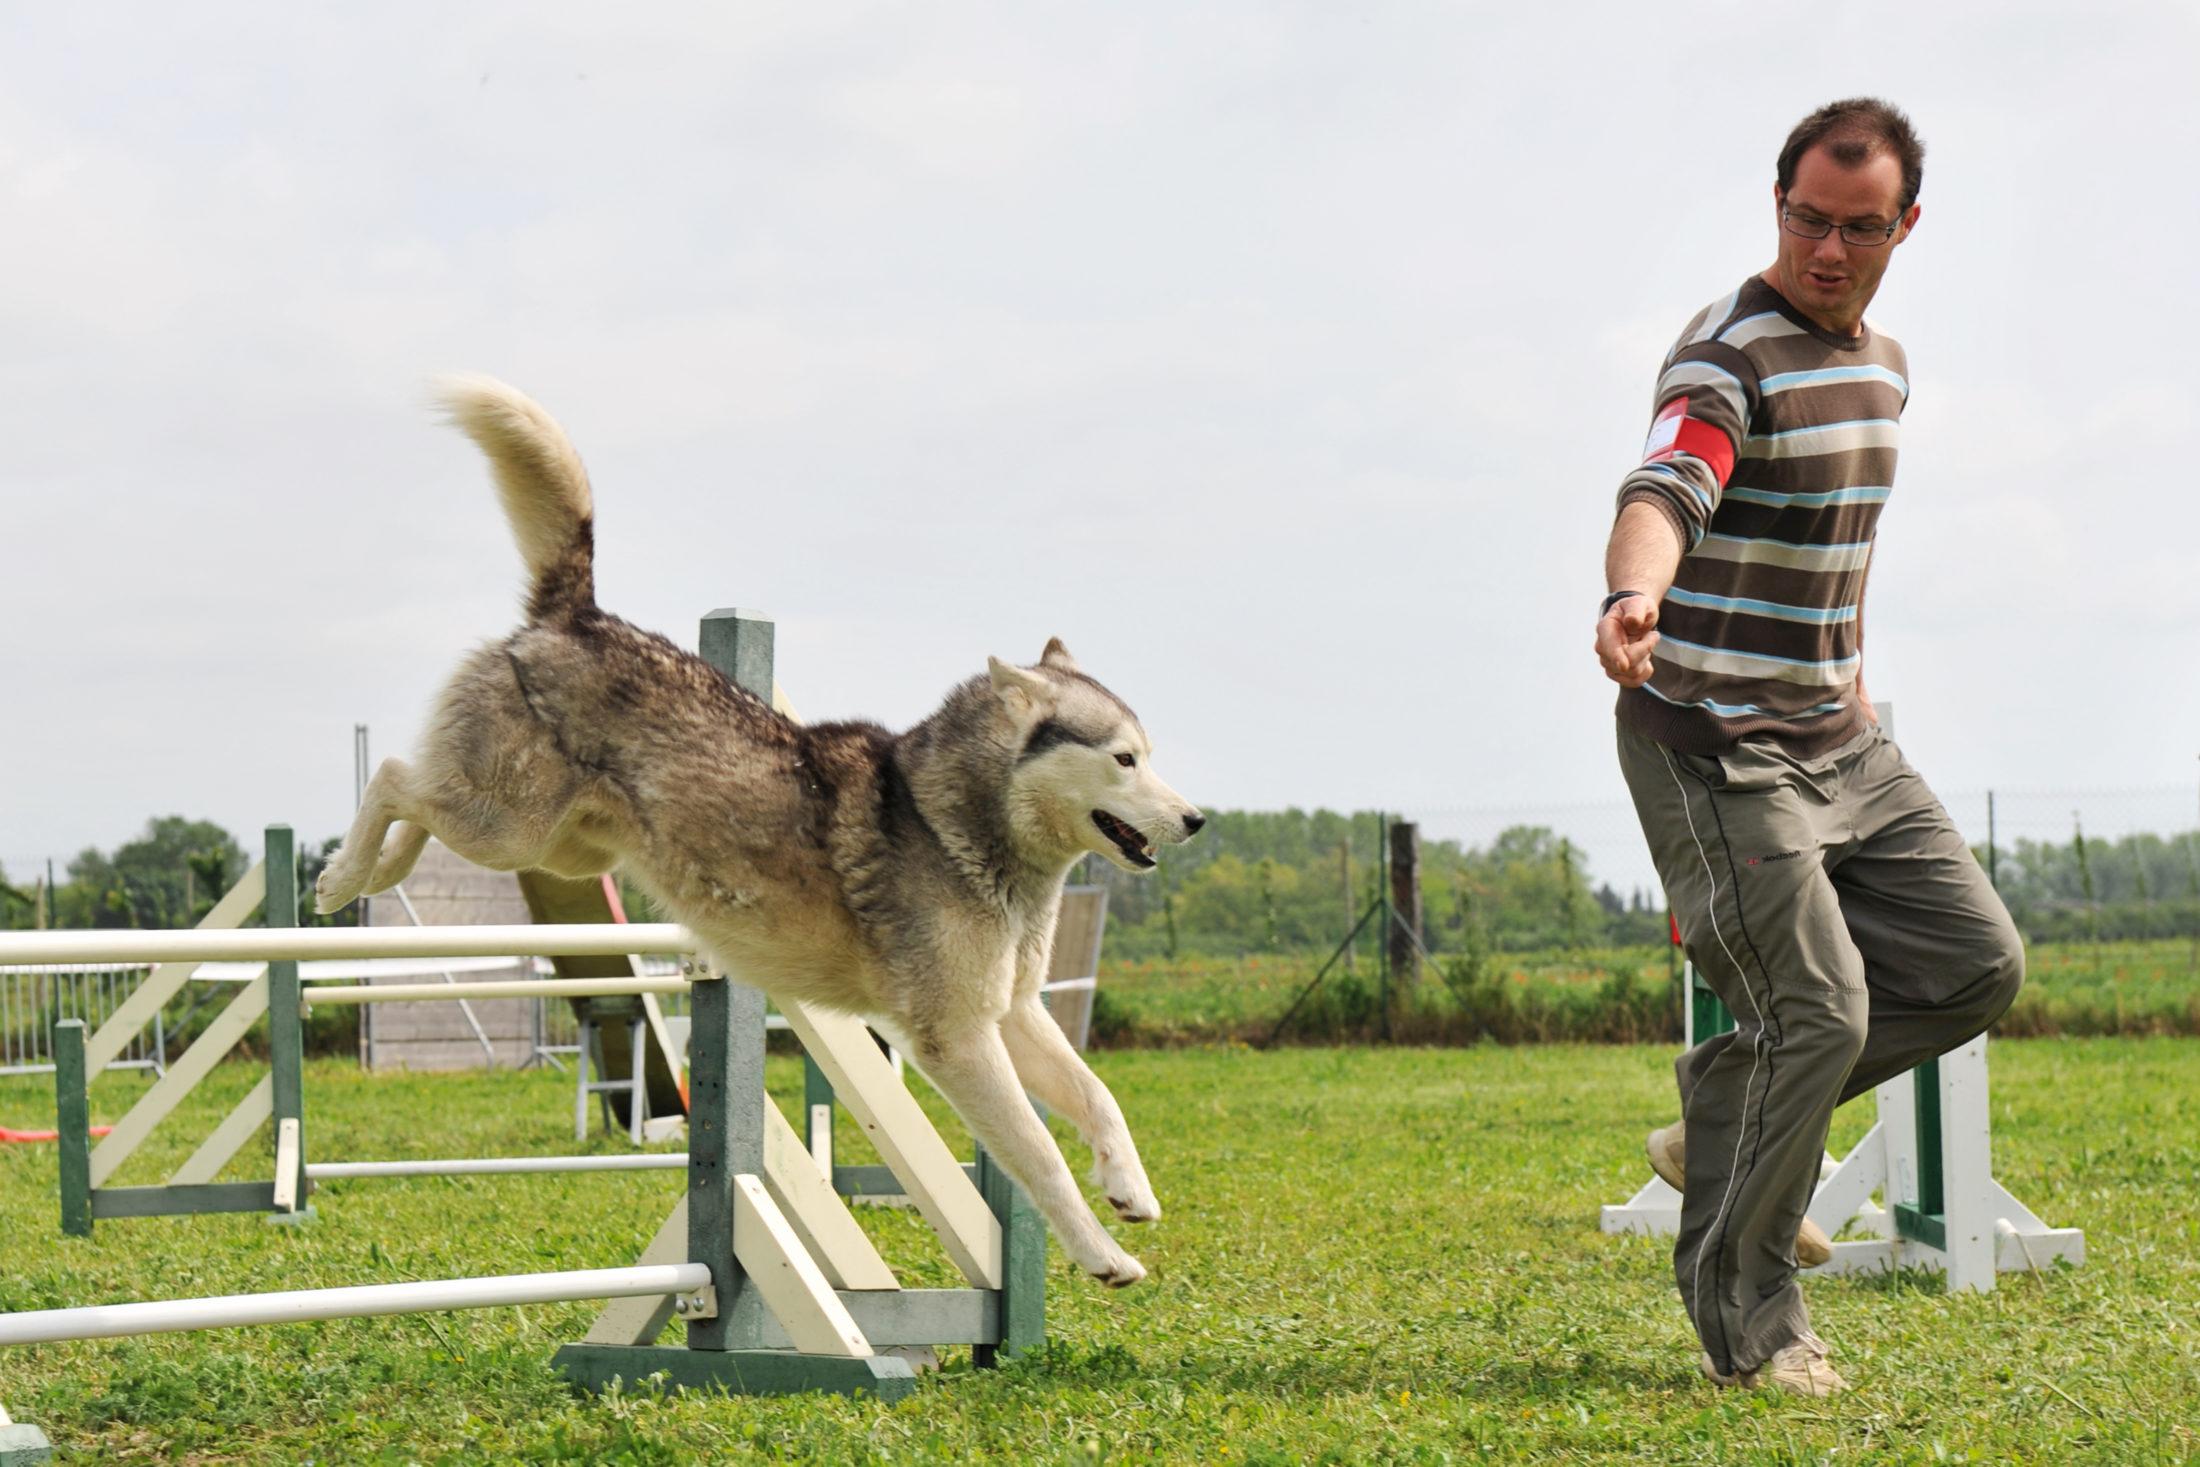 cachorro e tutor treinando juntos agilidade